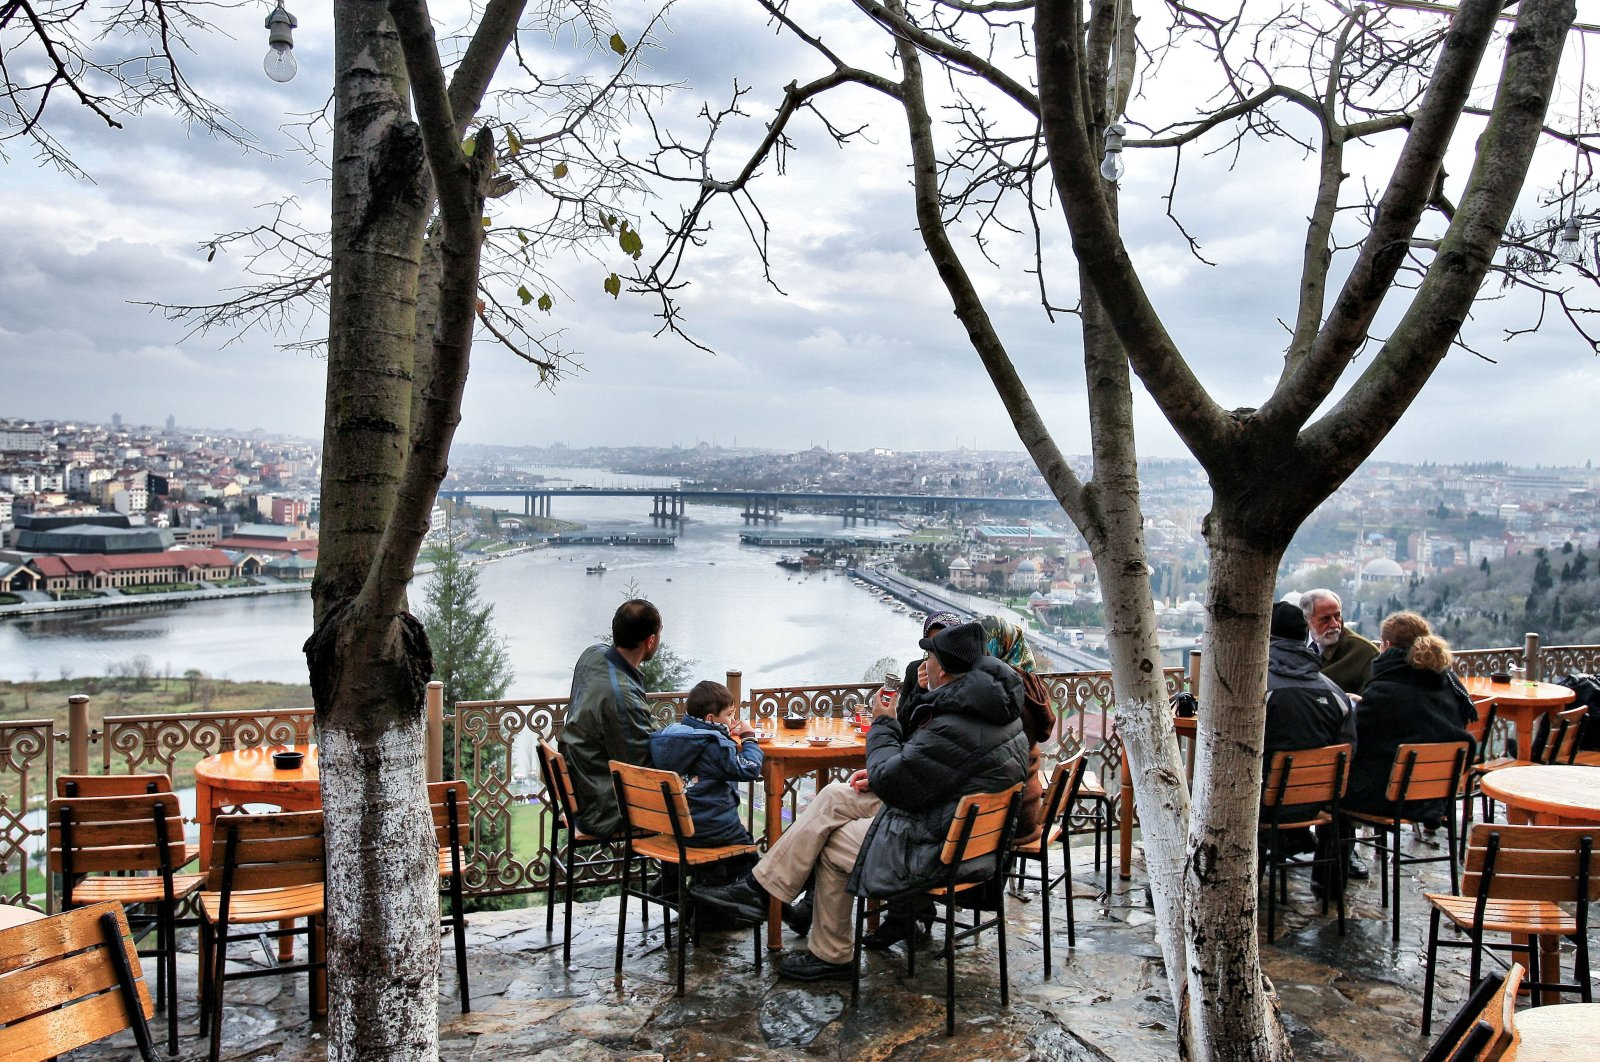 Pierre Loti Hill, in the Eyüp district, Istanbul, Turkey, Dec. 14, 2010. (Sabah File Photo)